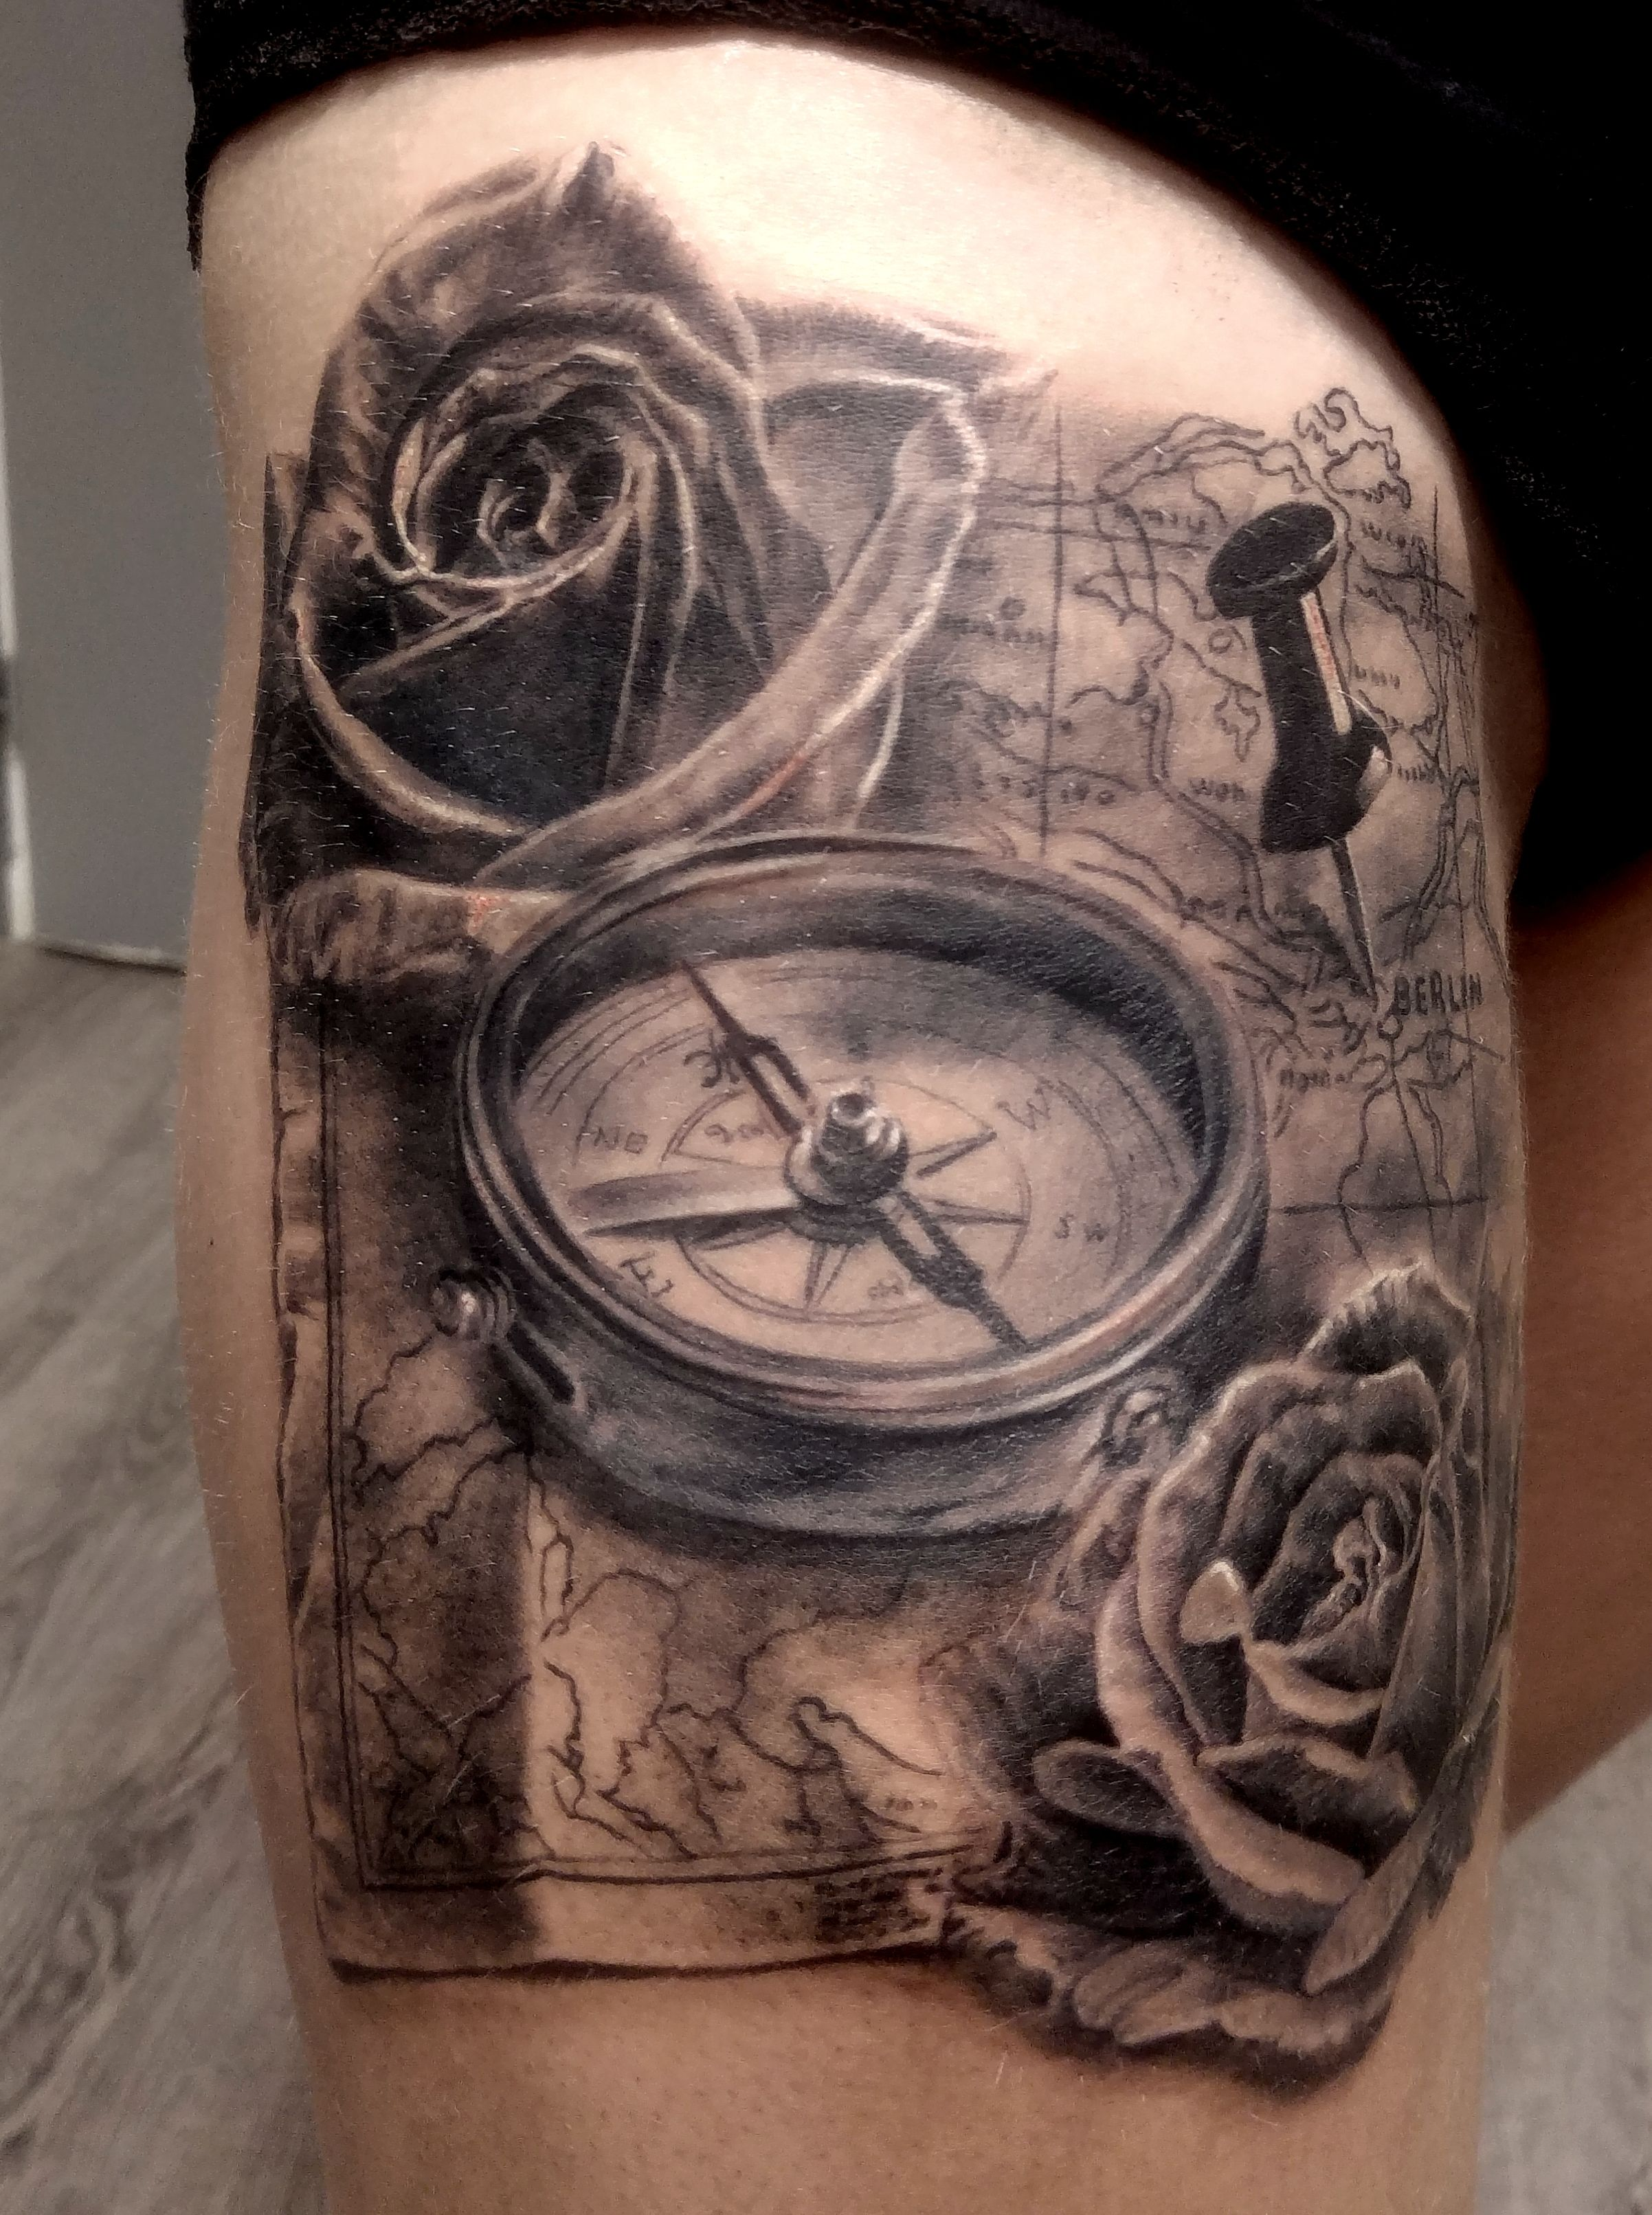 tatouage roses carte boussole par stephane bueno tatoueur. Black Bedroom Furniture Sets. Home Design Ideas